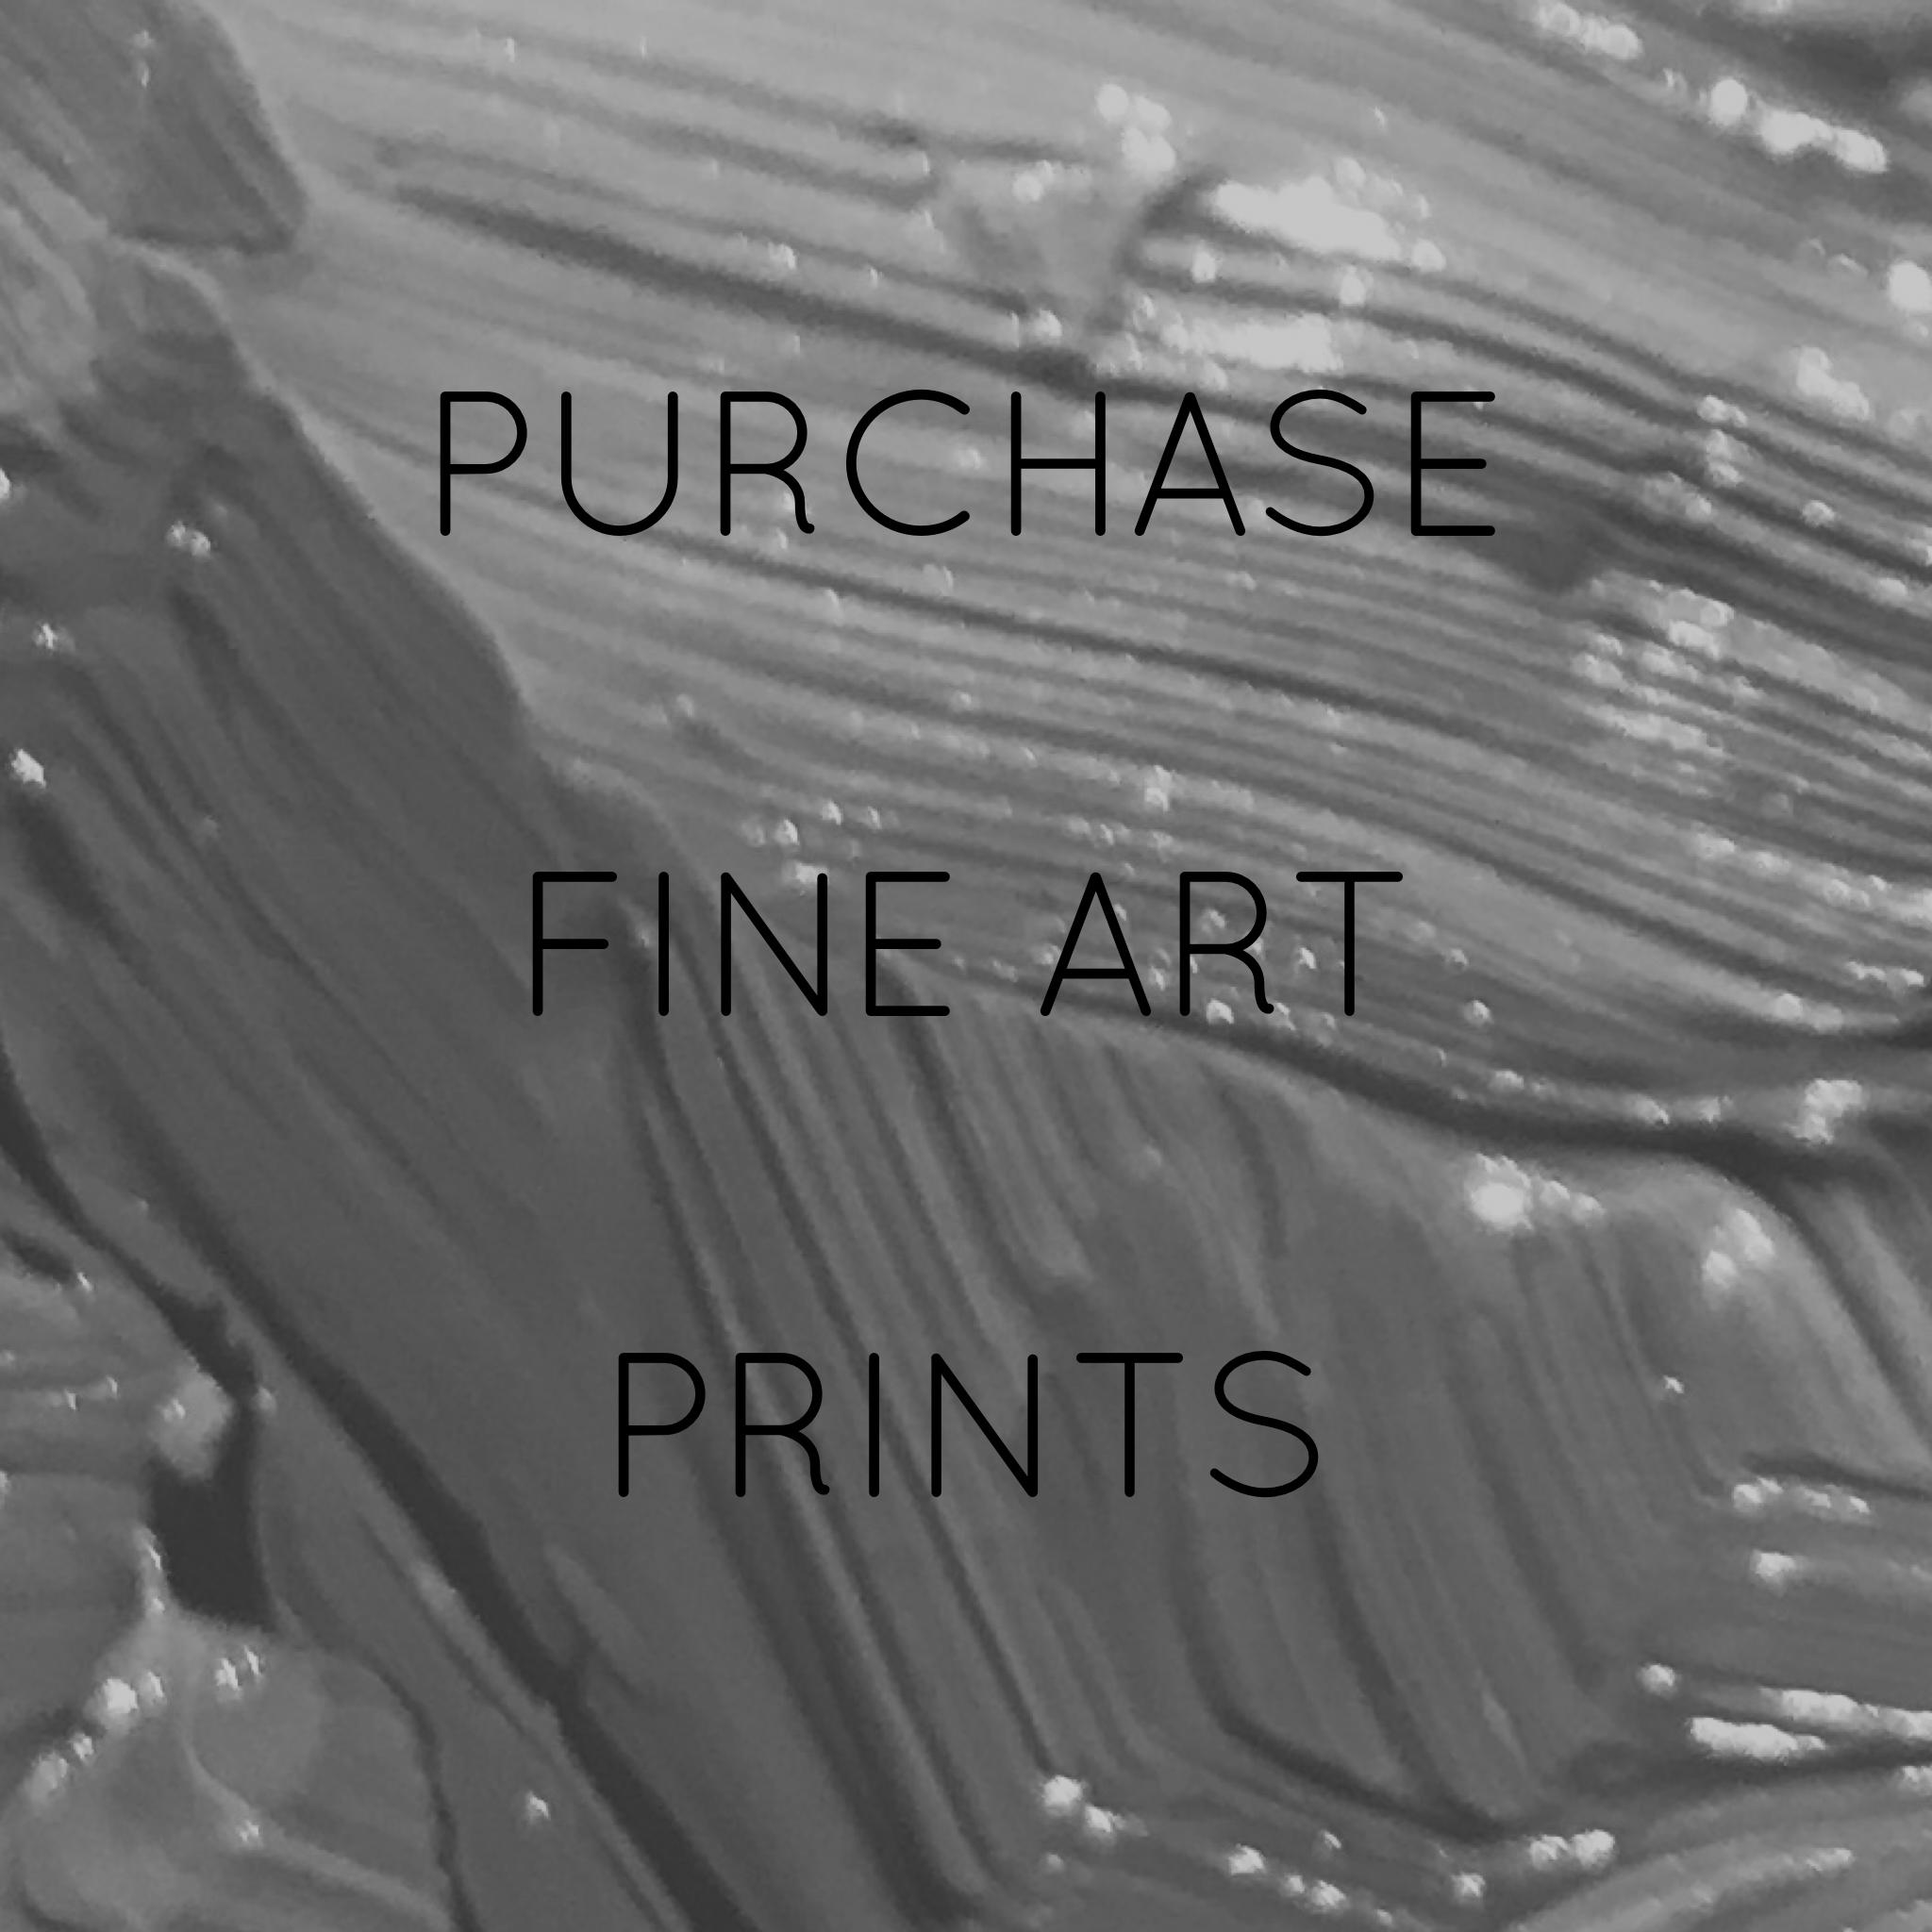 purchase-fine-art-prints.png